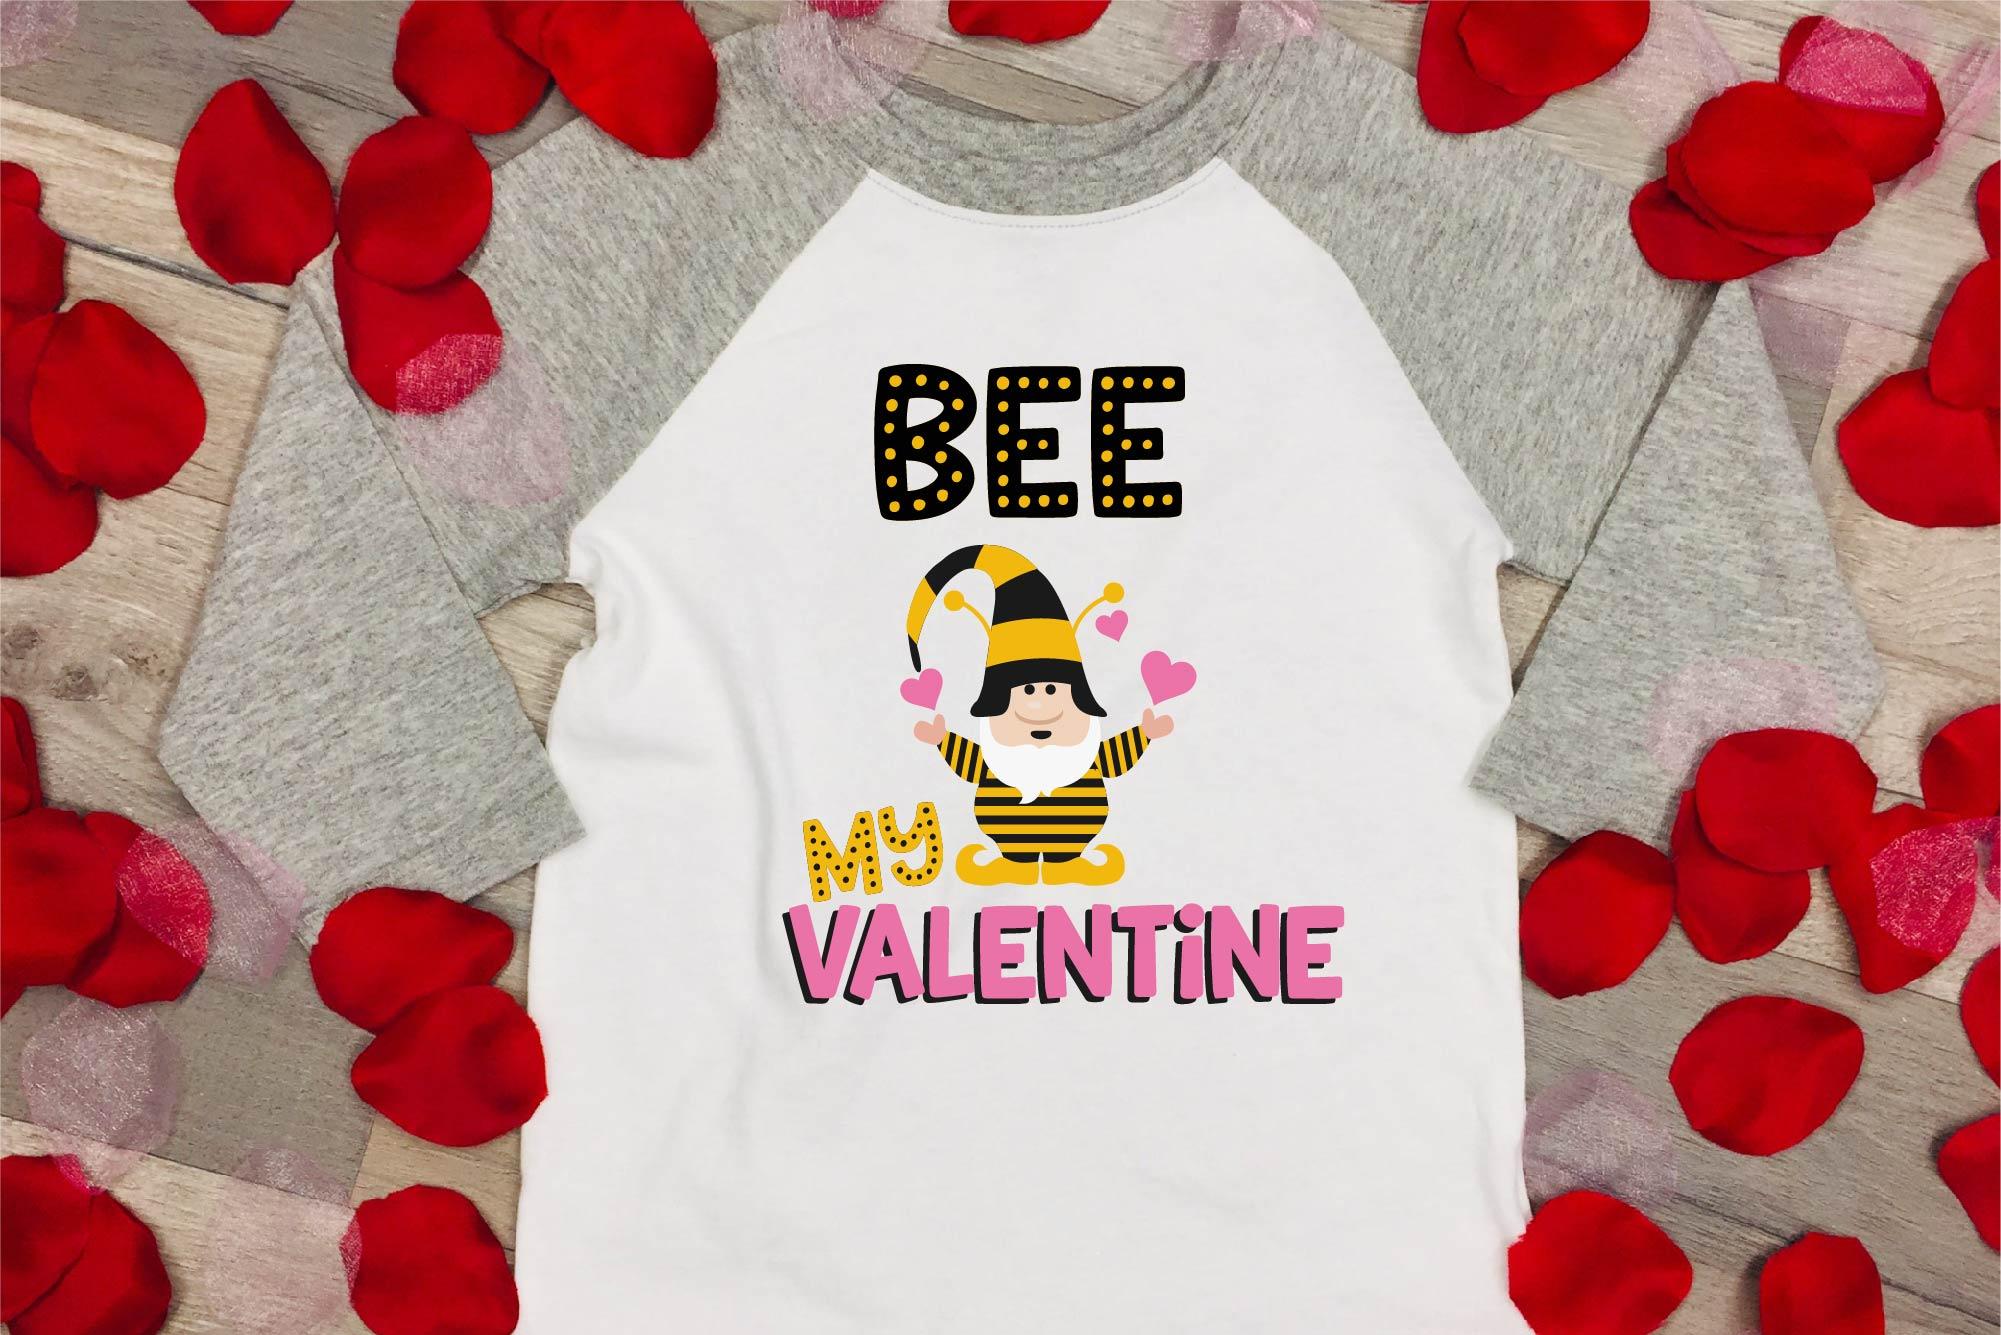 Valentine's Day SVG Valentine Gnome Bee My Valentine SVG example image 2